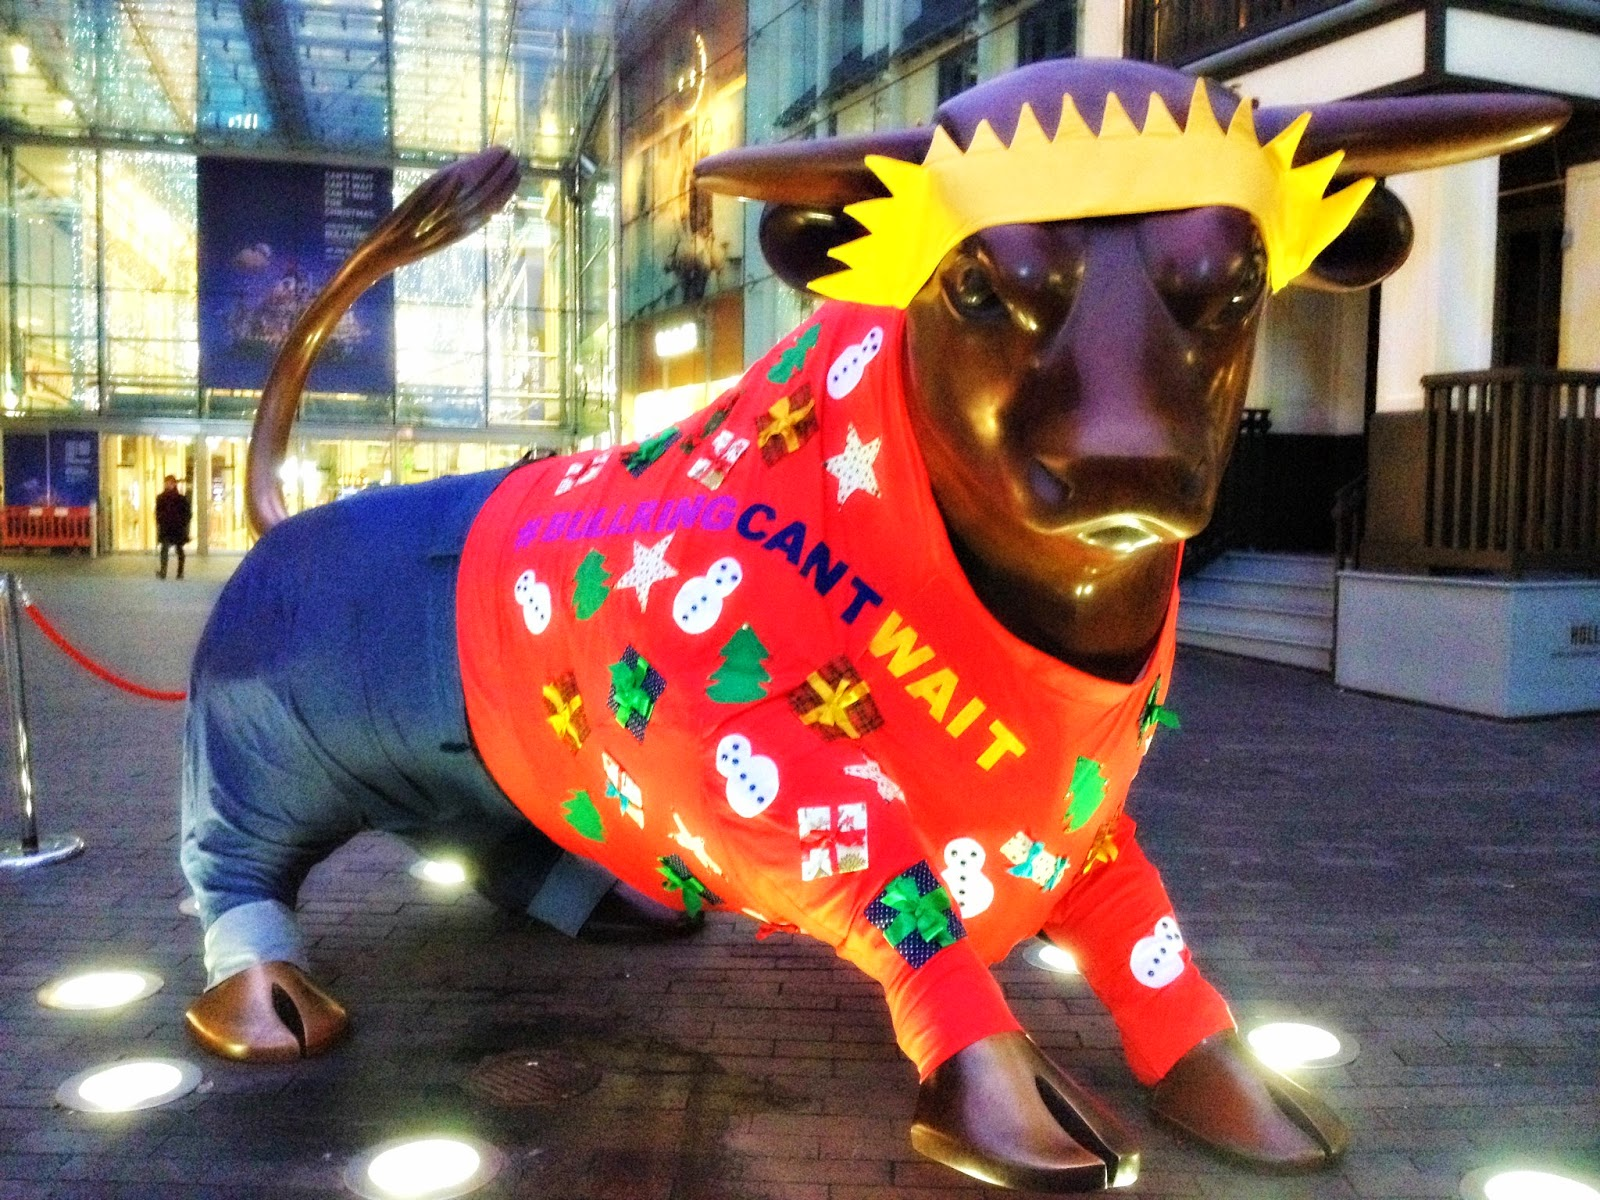 The Bull Birmingham Christmas jumper